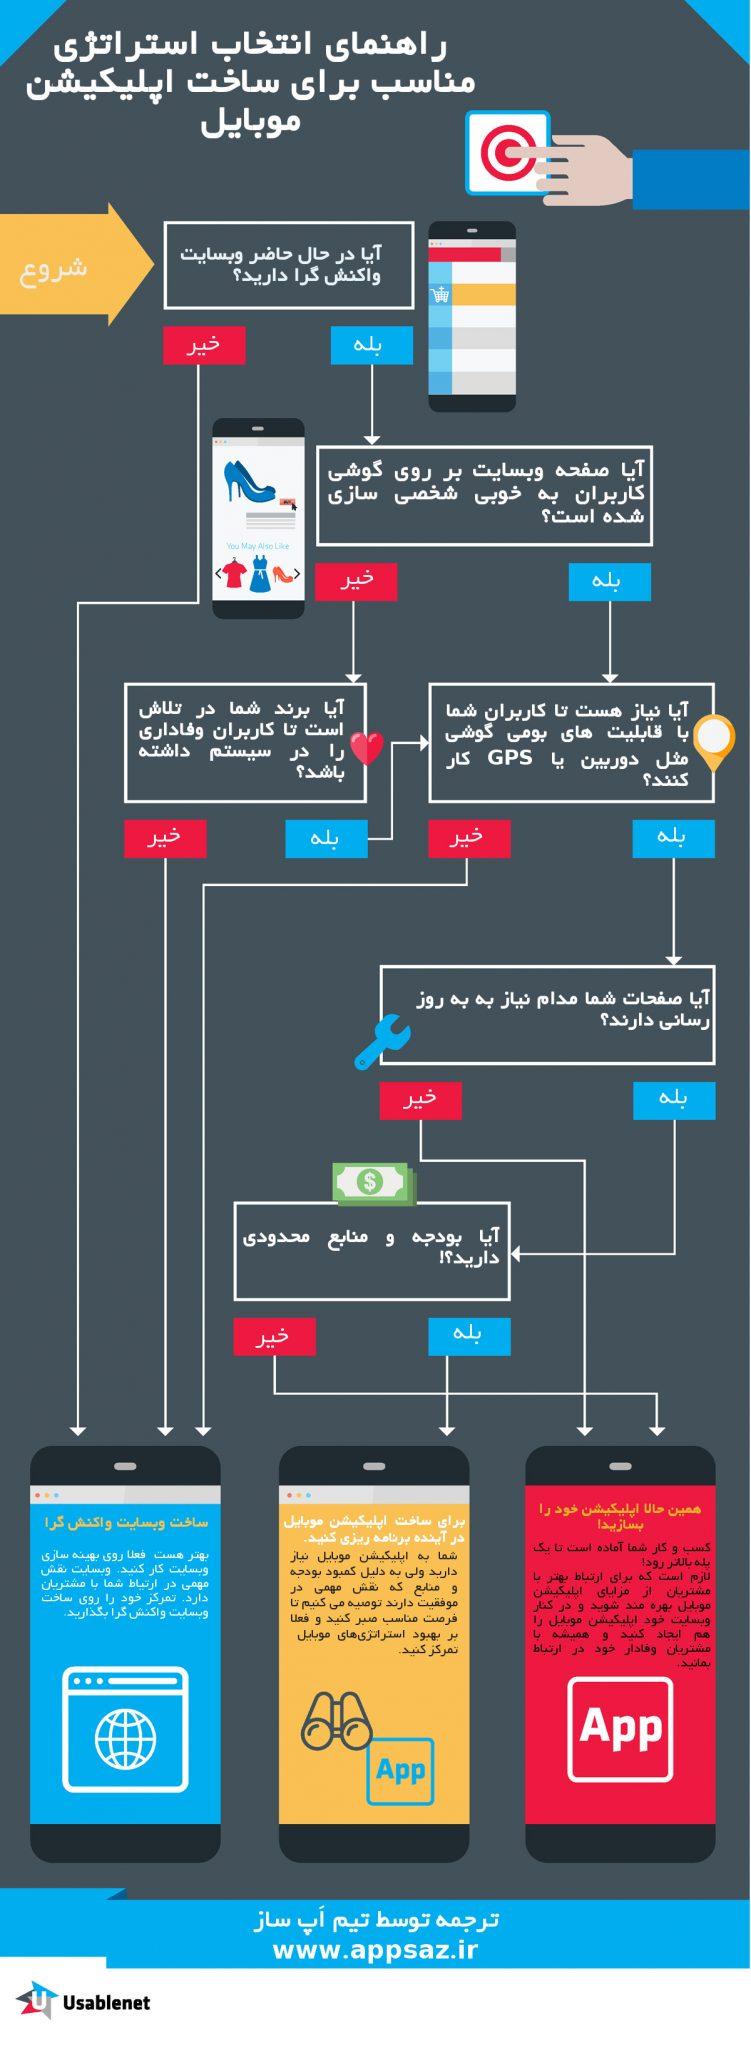 infoo2 - اینفوگرافی-راهنمای انتخاب استراتژی مناسب برای ساخت اپلیکیشن موبایل